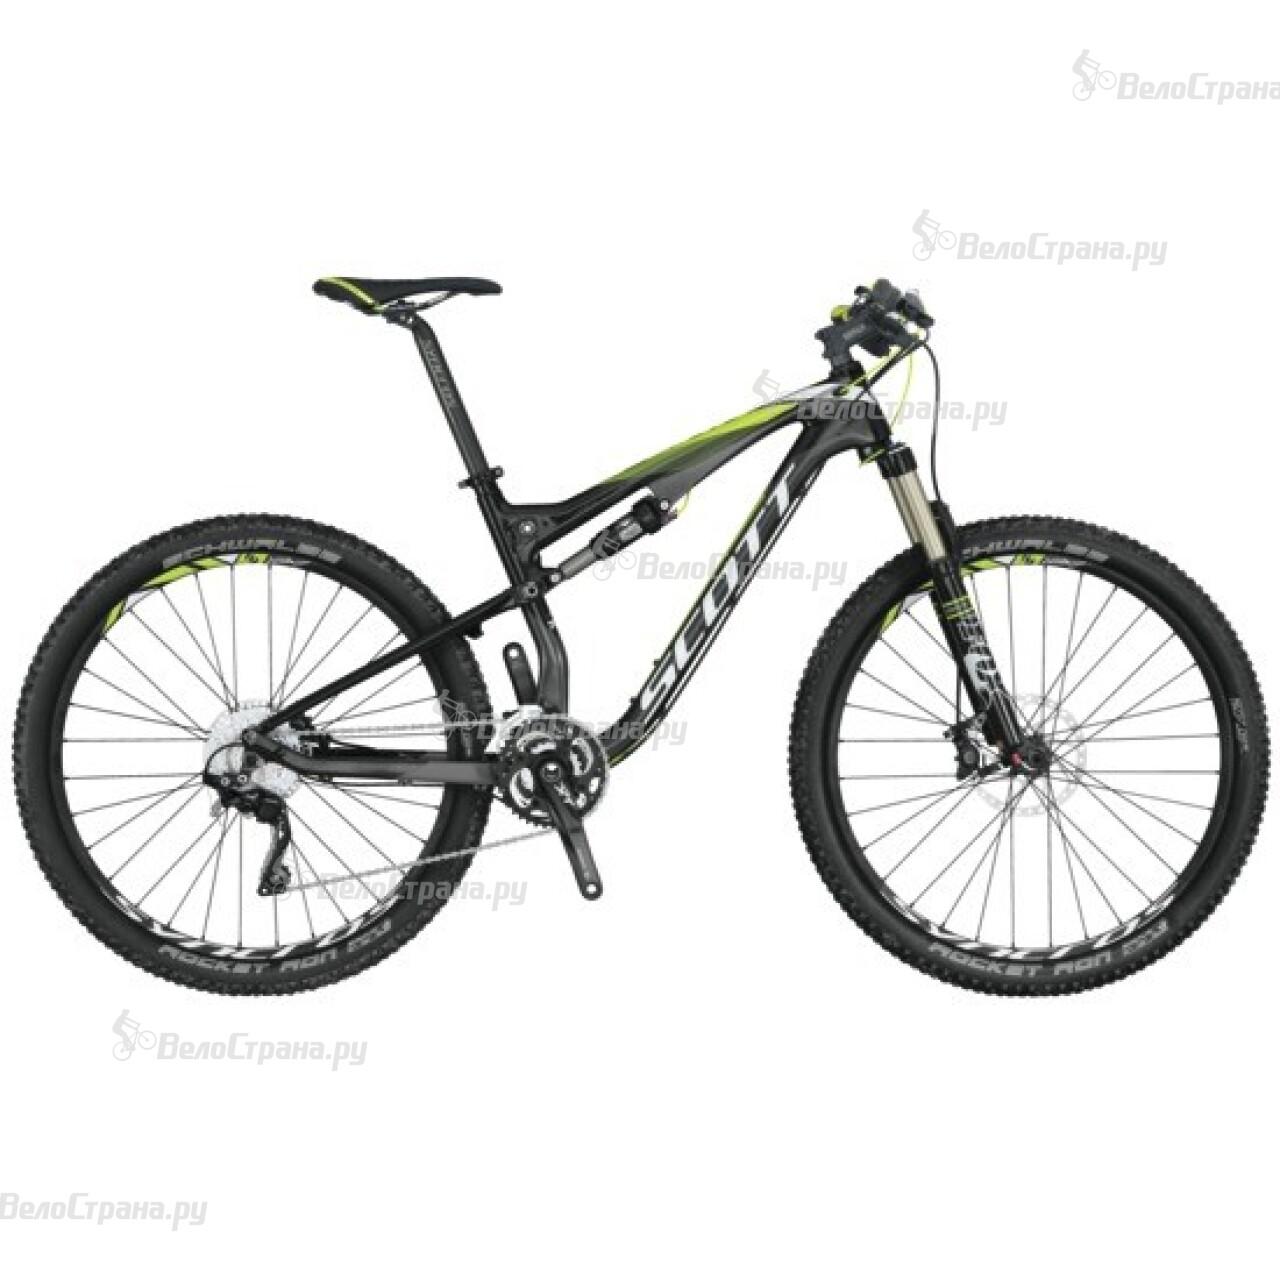 Велосипед Scott Spark 720 (2014) велосипед scott spark 720 2015